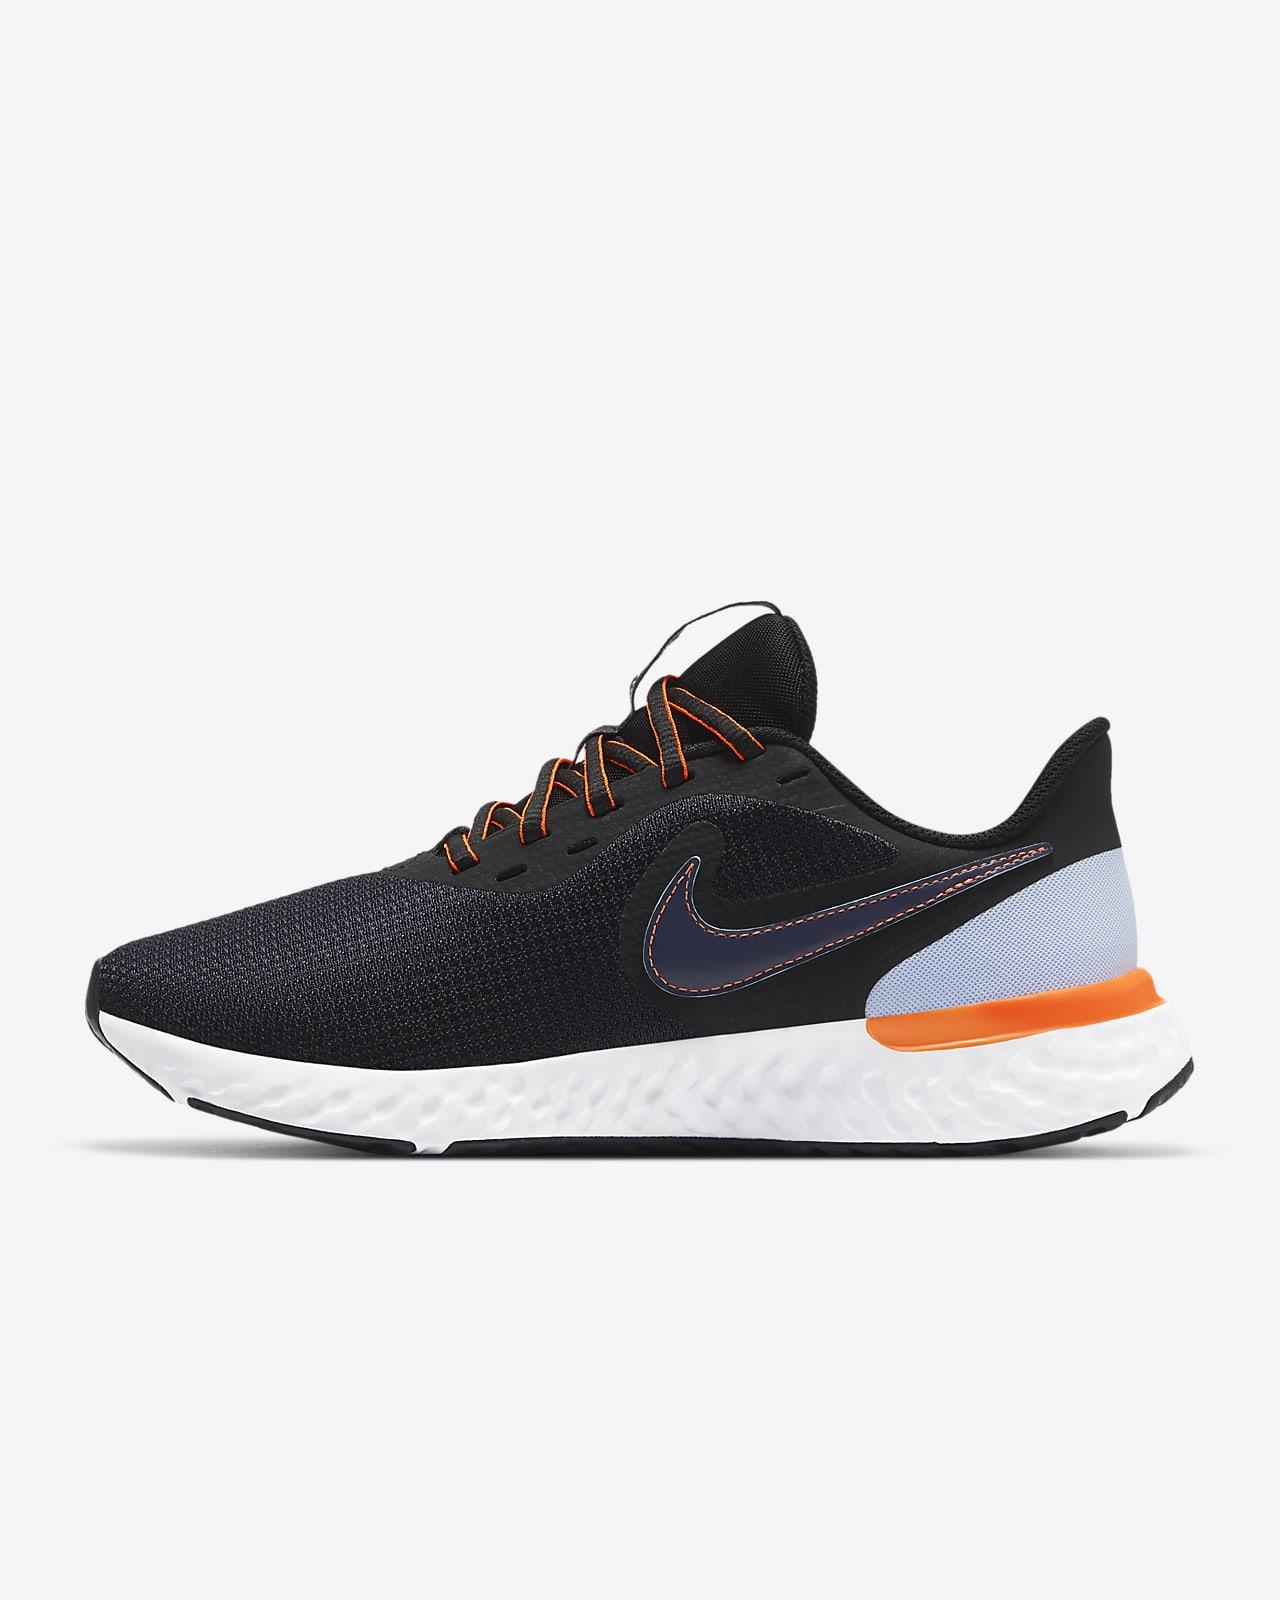 móvil Reconocimiento lente  Calzado de running para mujer Nike Revolution 5 EXT. Nike MX